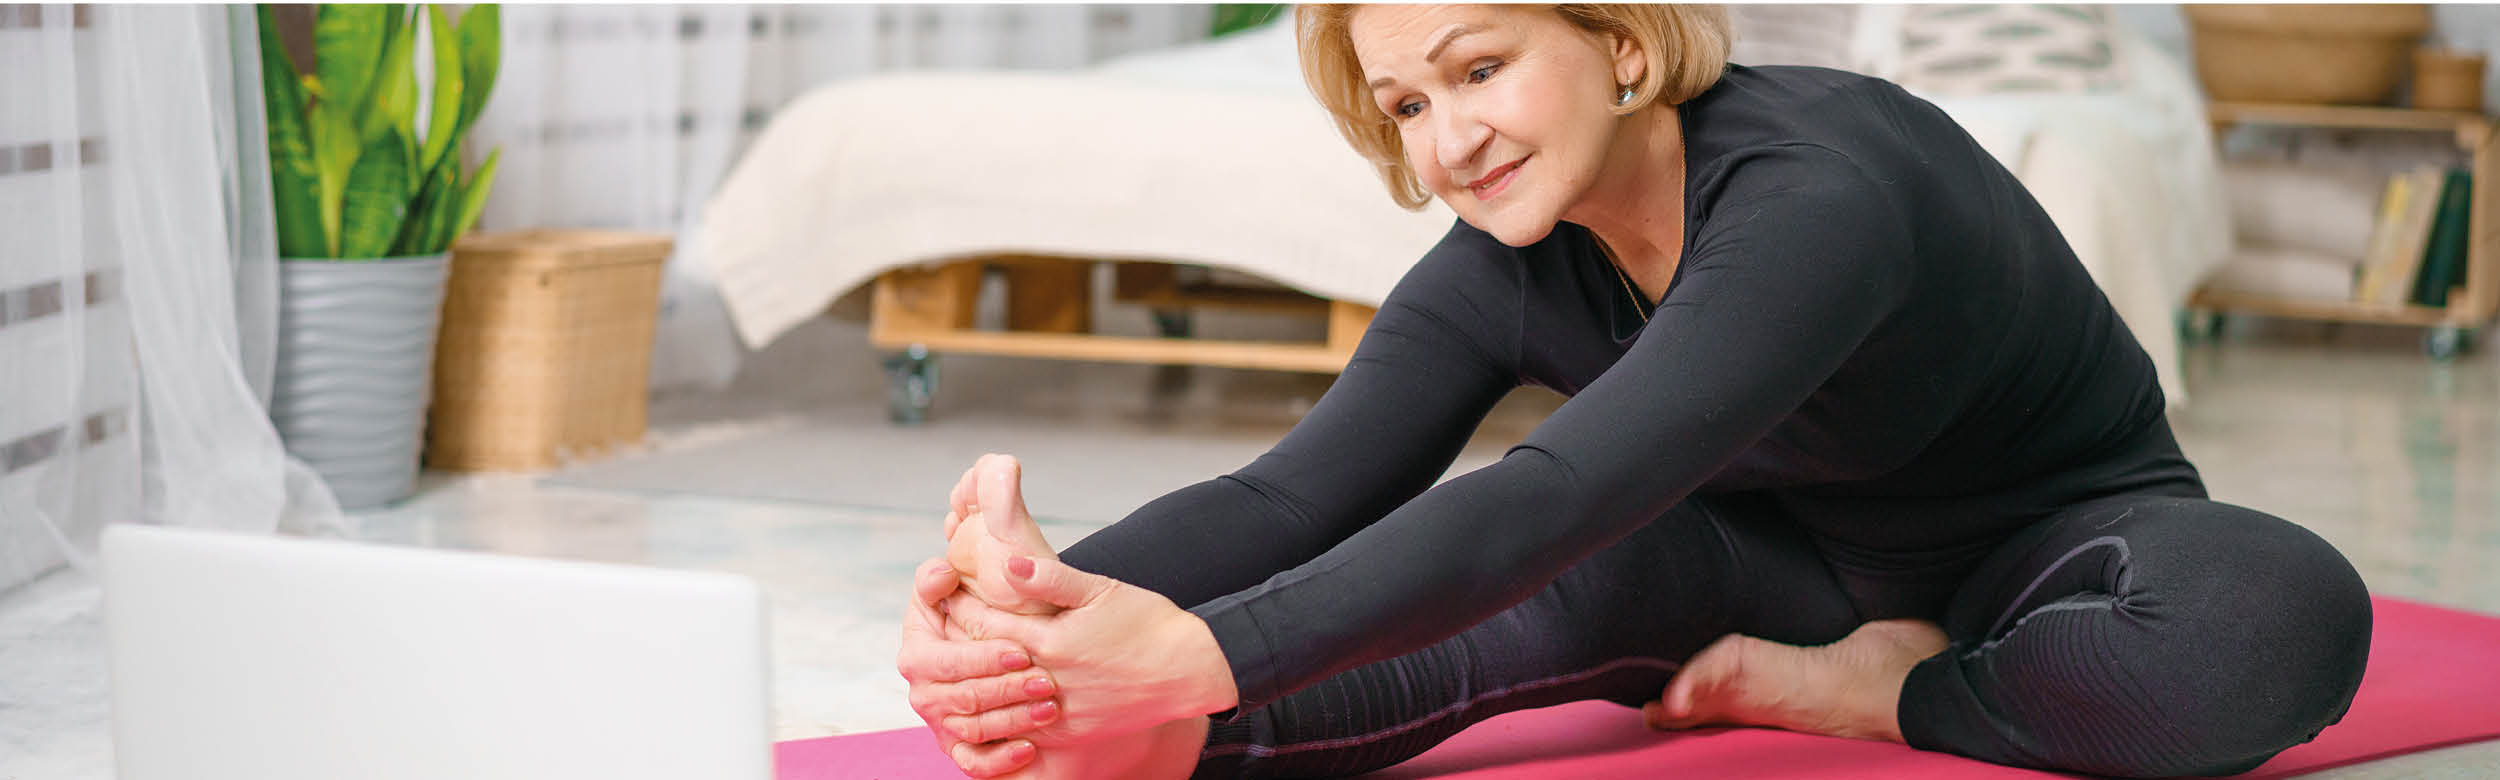 Join online slow flow yoga with Carol McFarlane at Restoration Yard